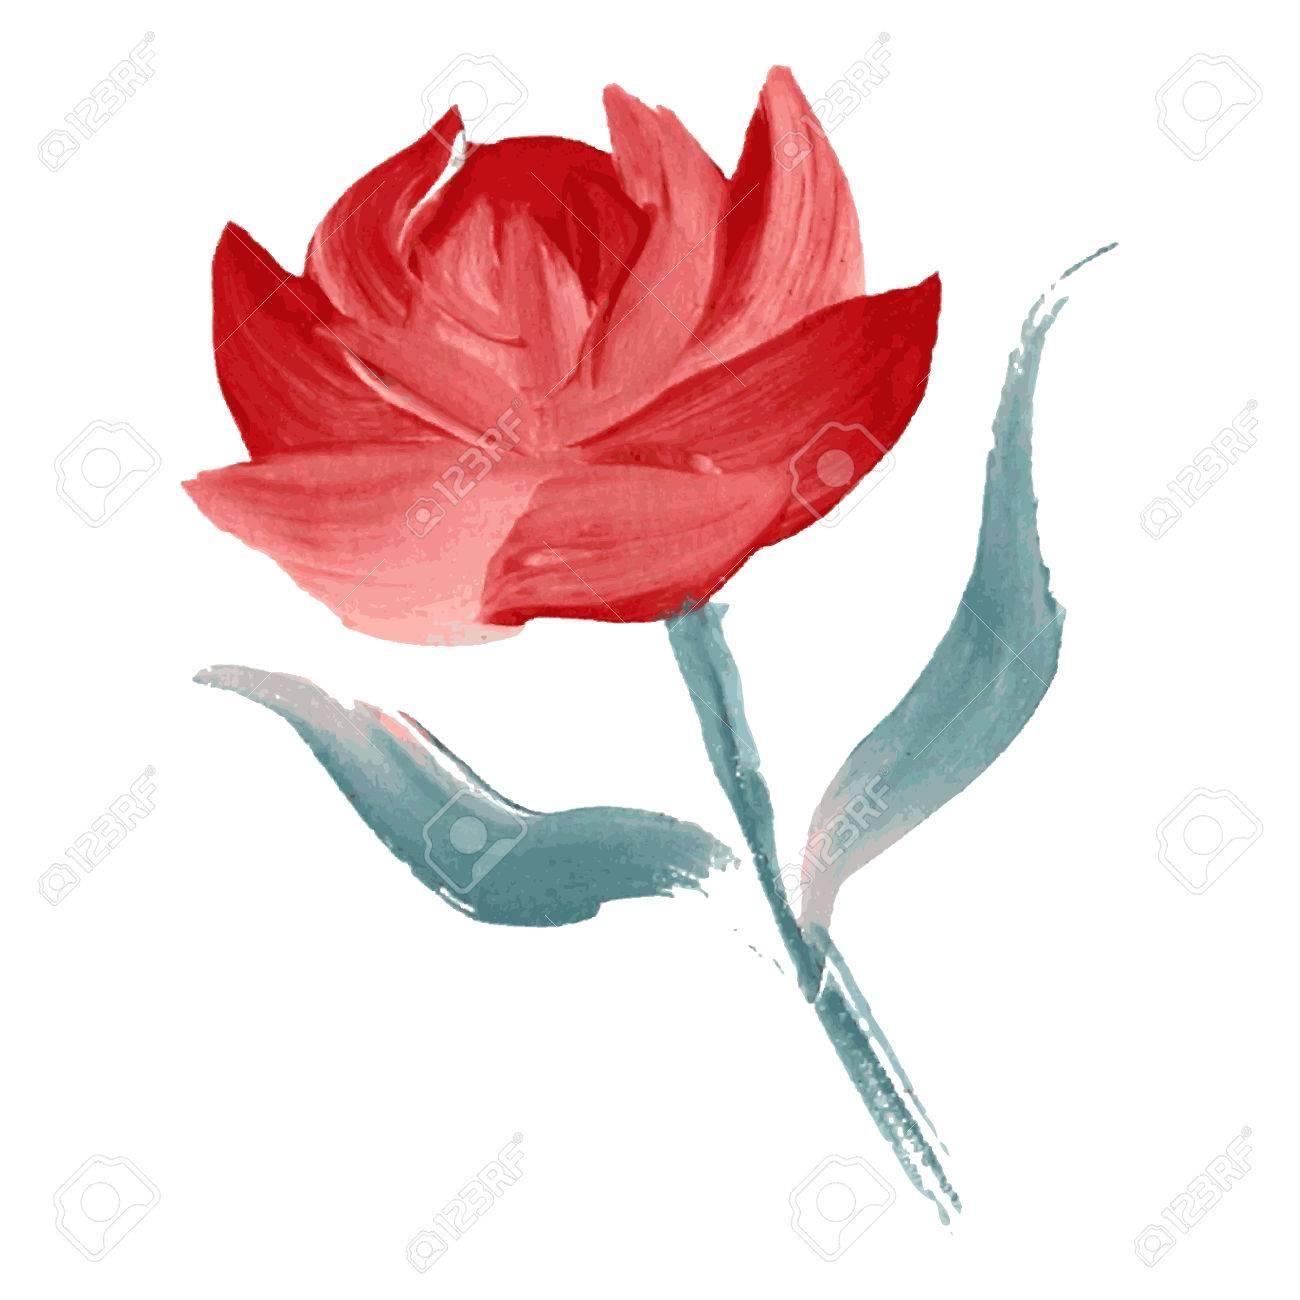 Dekorative Ol Gemalt Rote Rose Blume Design Element Kann Fur